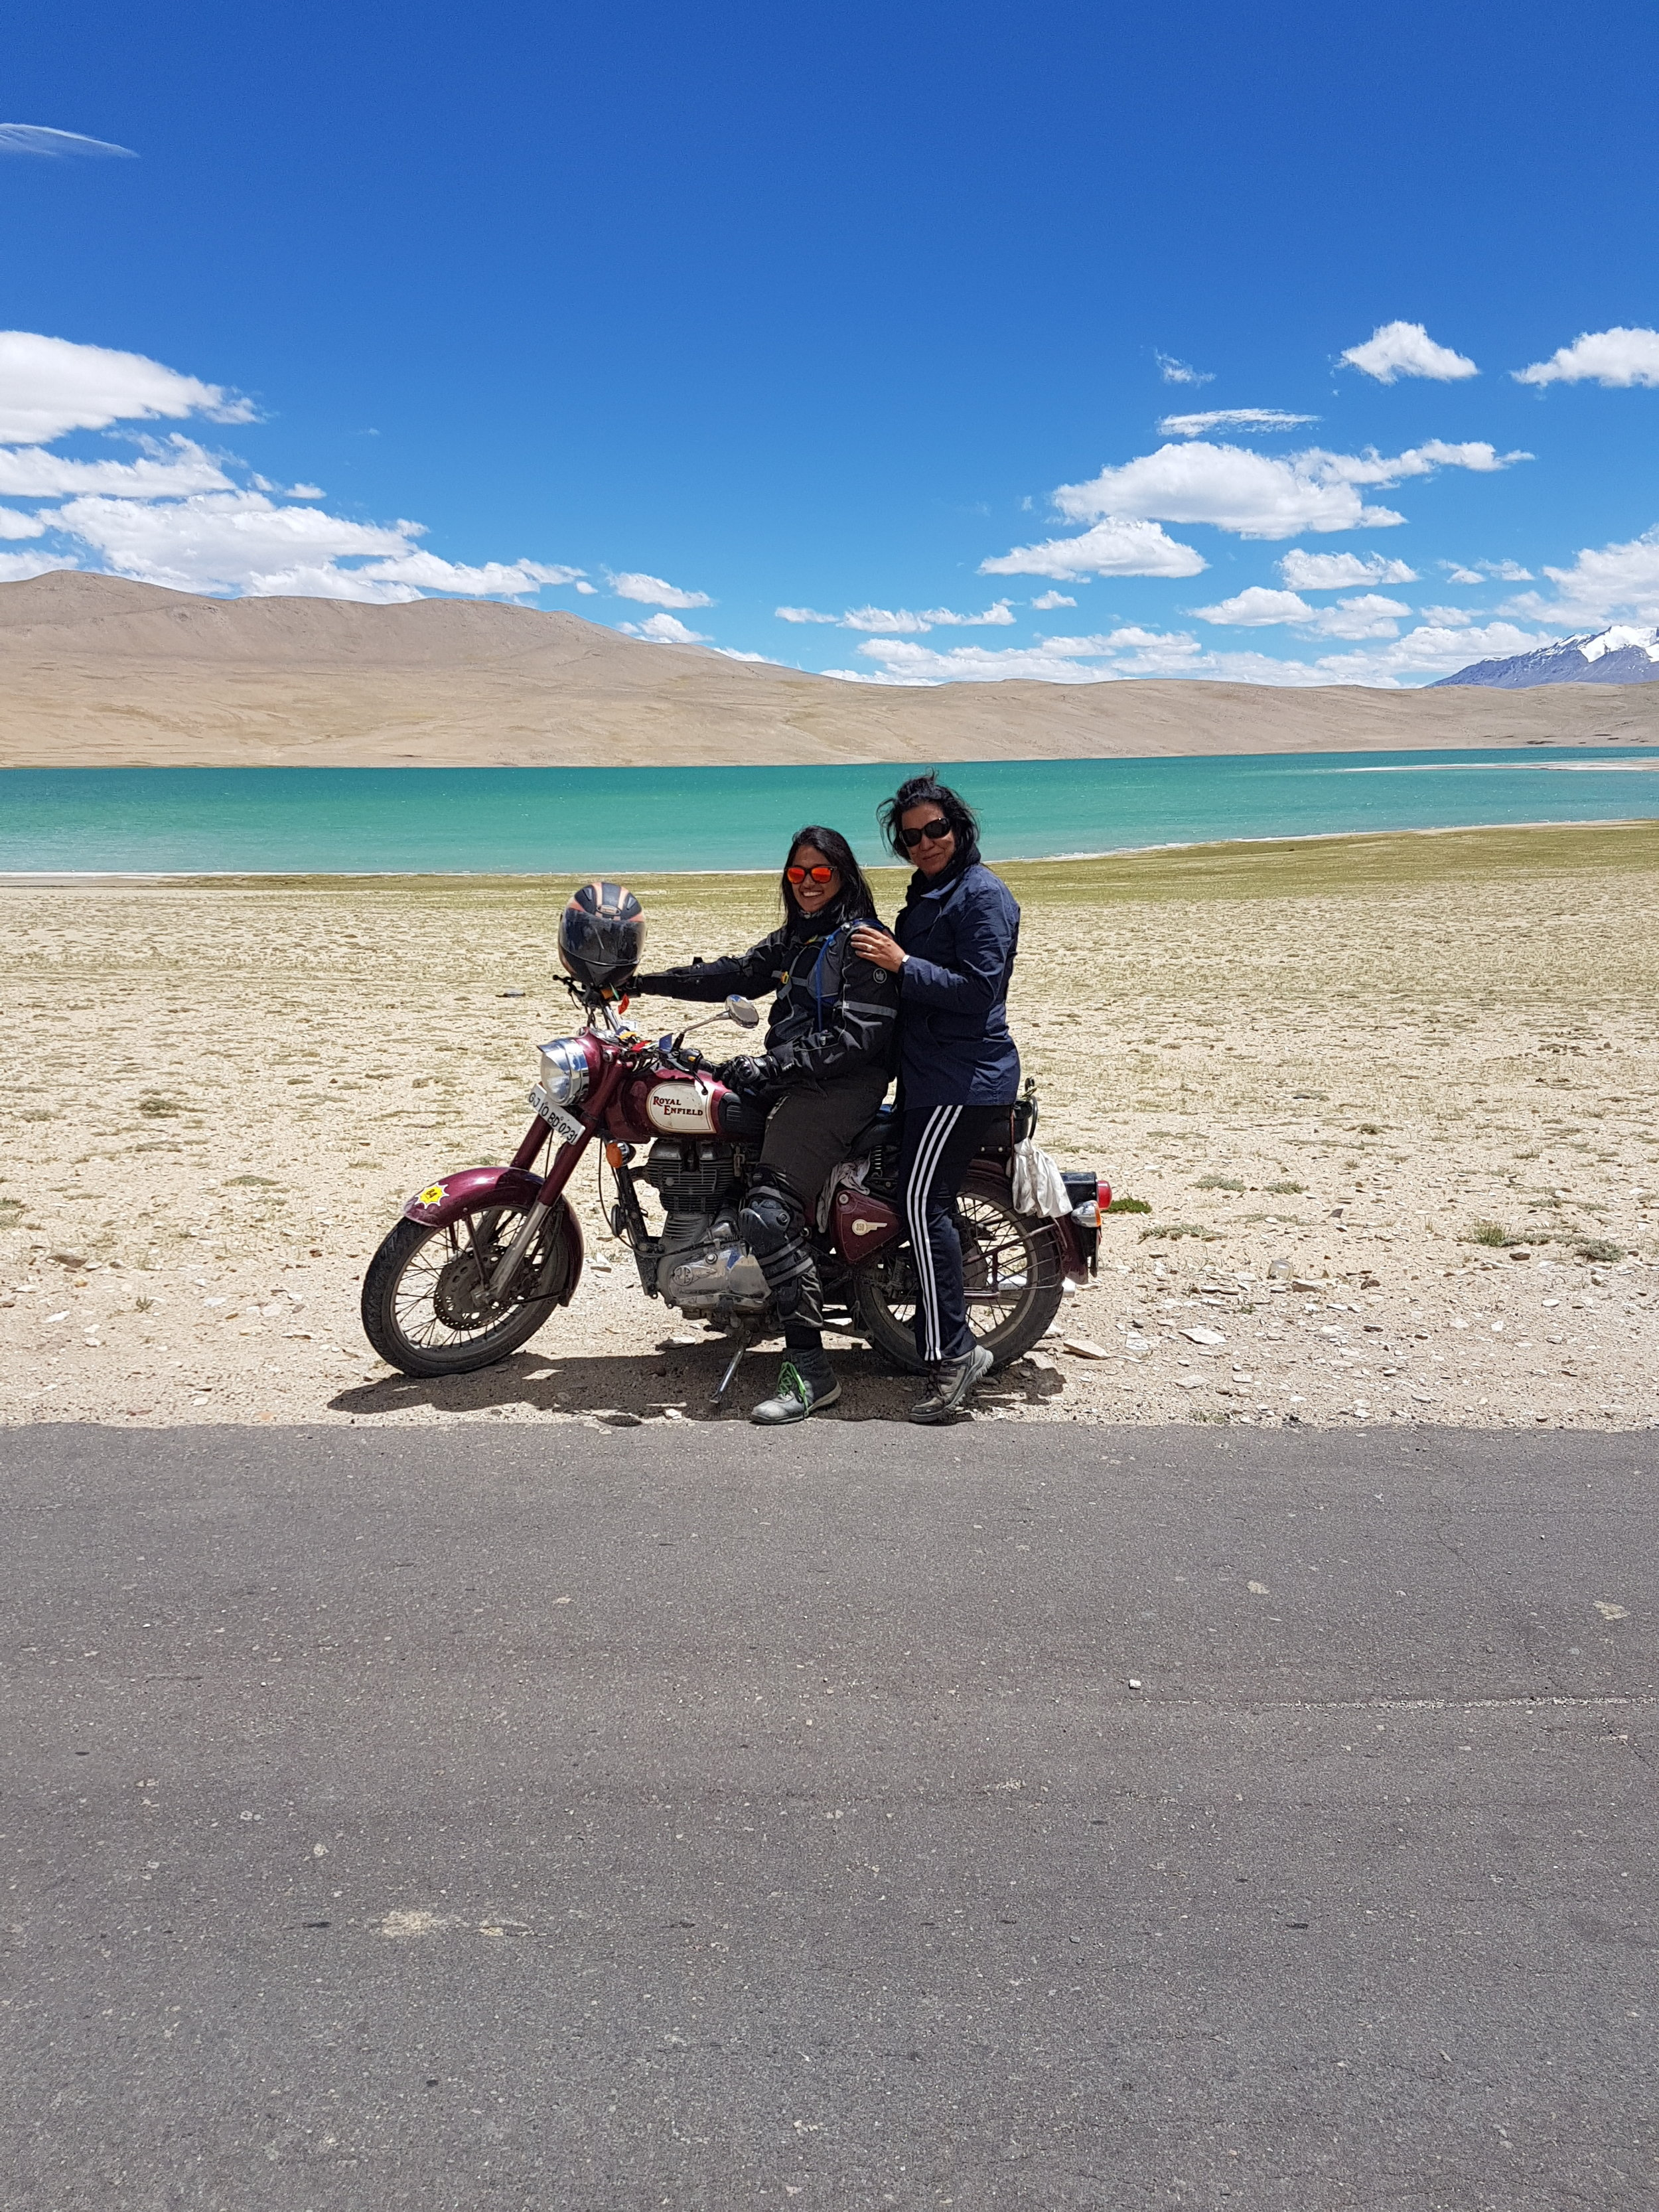 The enchanting moments of Manali to Leh bike trip